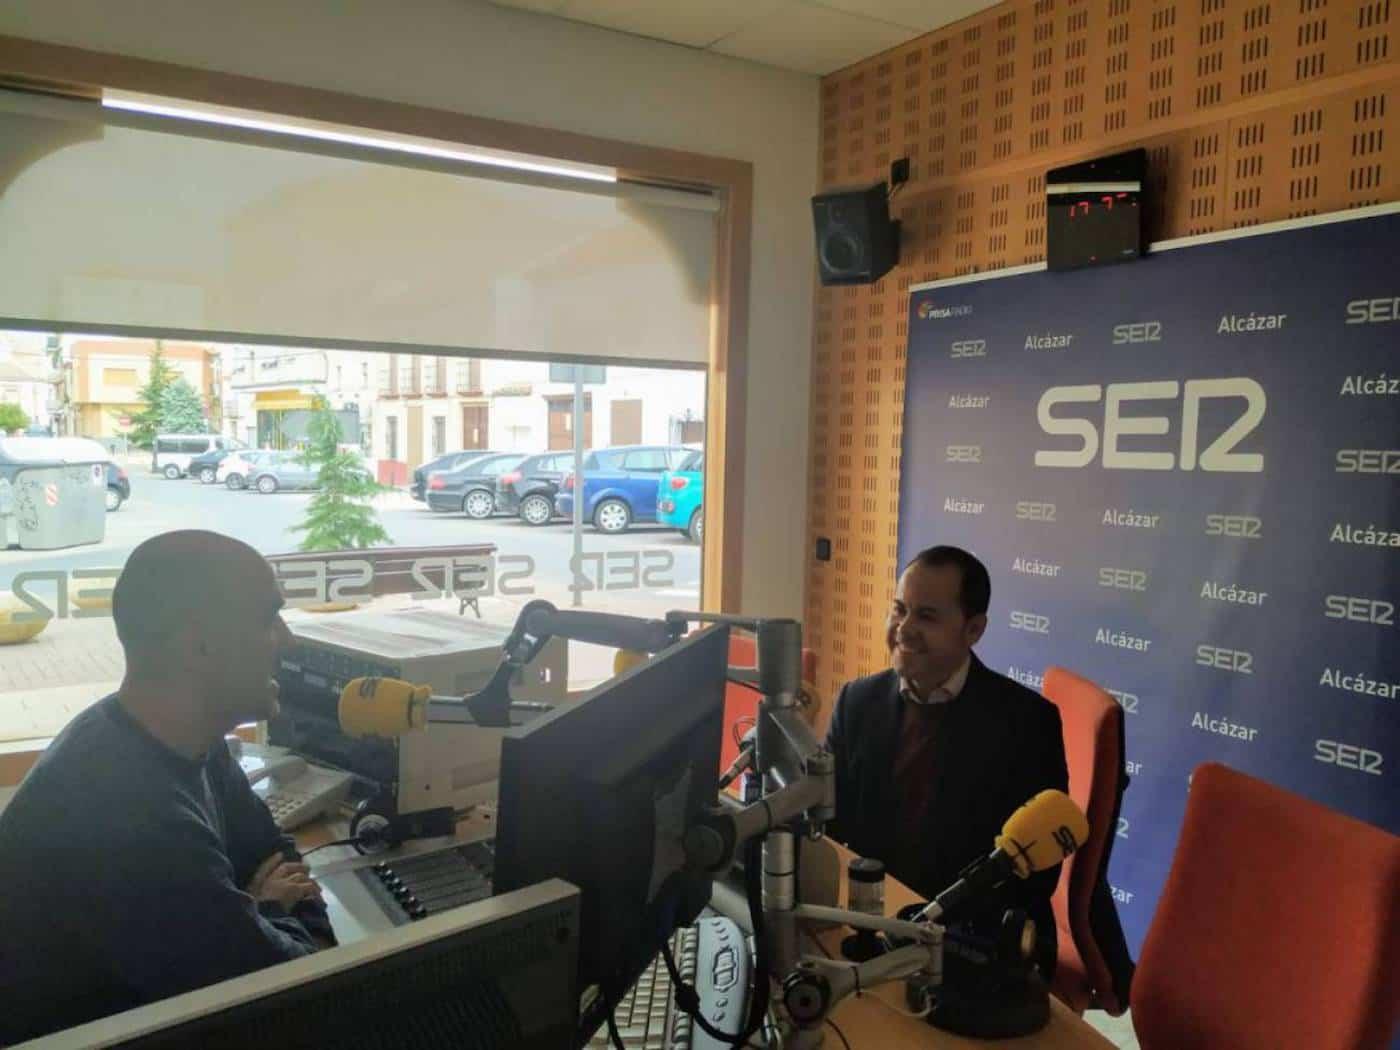 alcalde herencia en ser alcazar - Entrevista al alcalde de Herencia en SER Alcázar